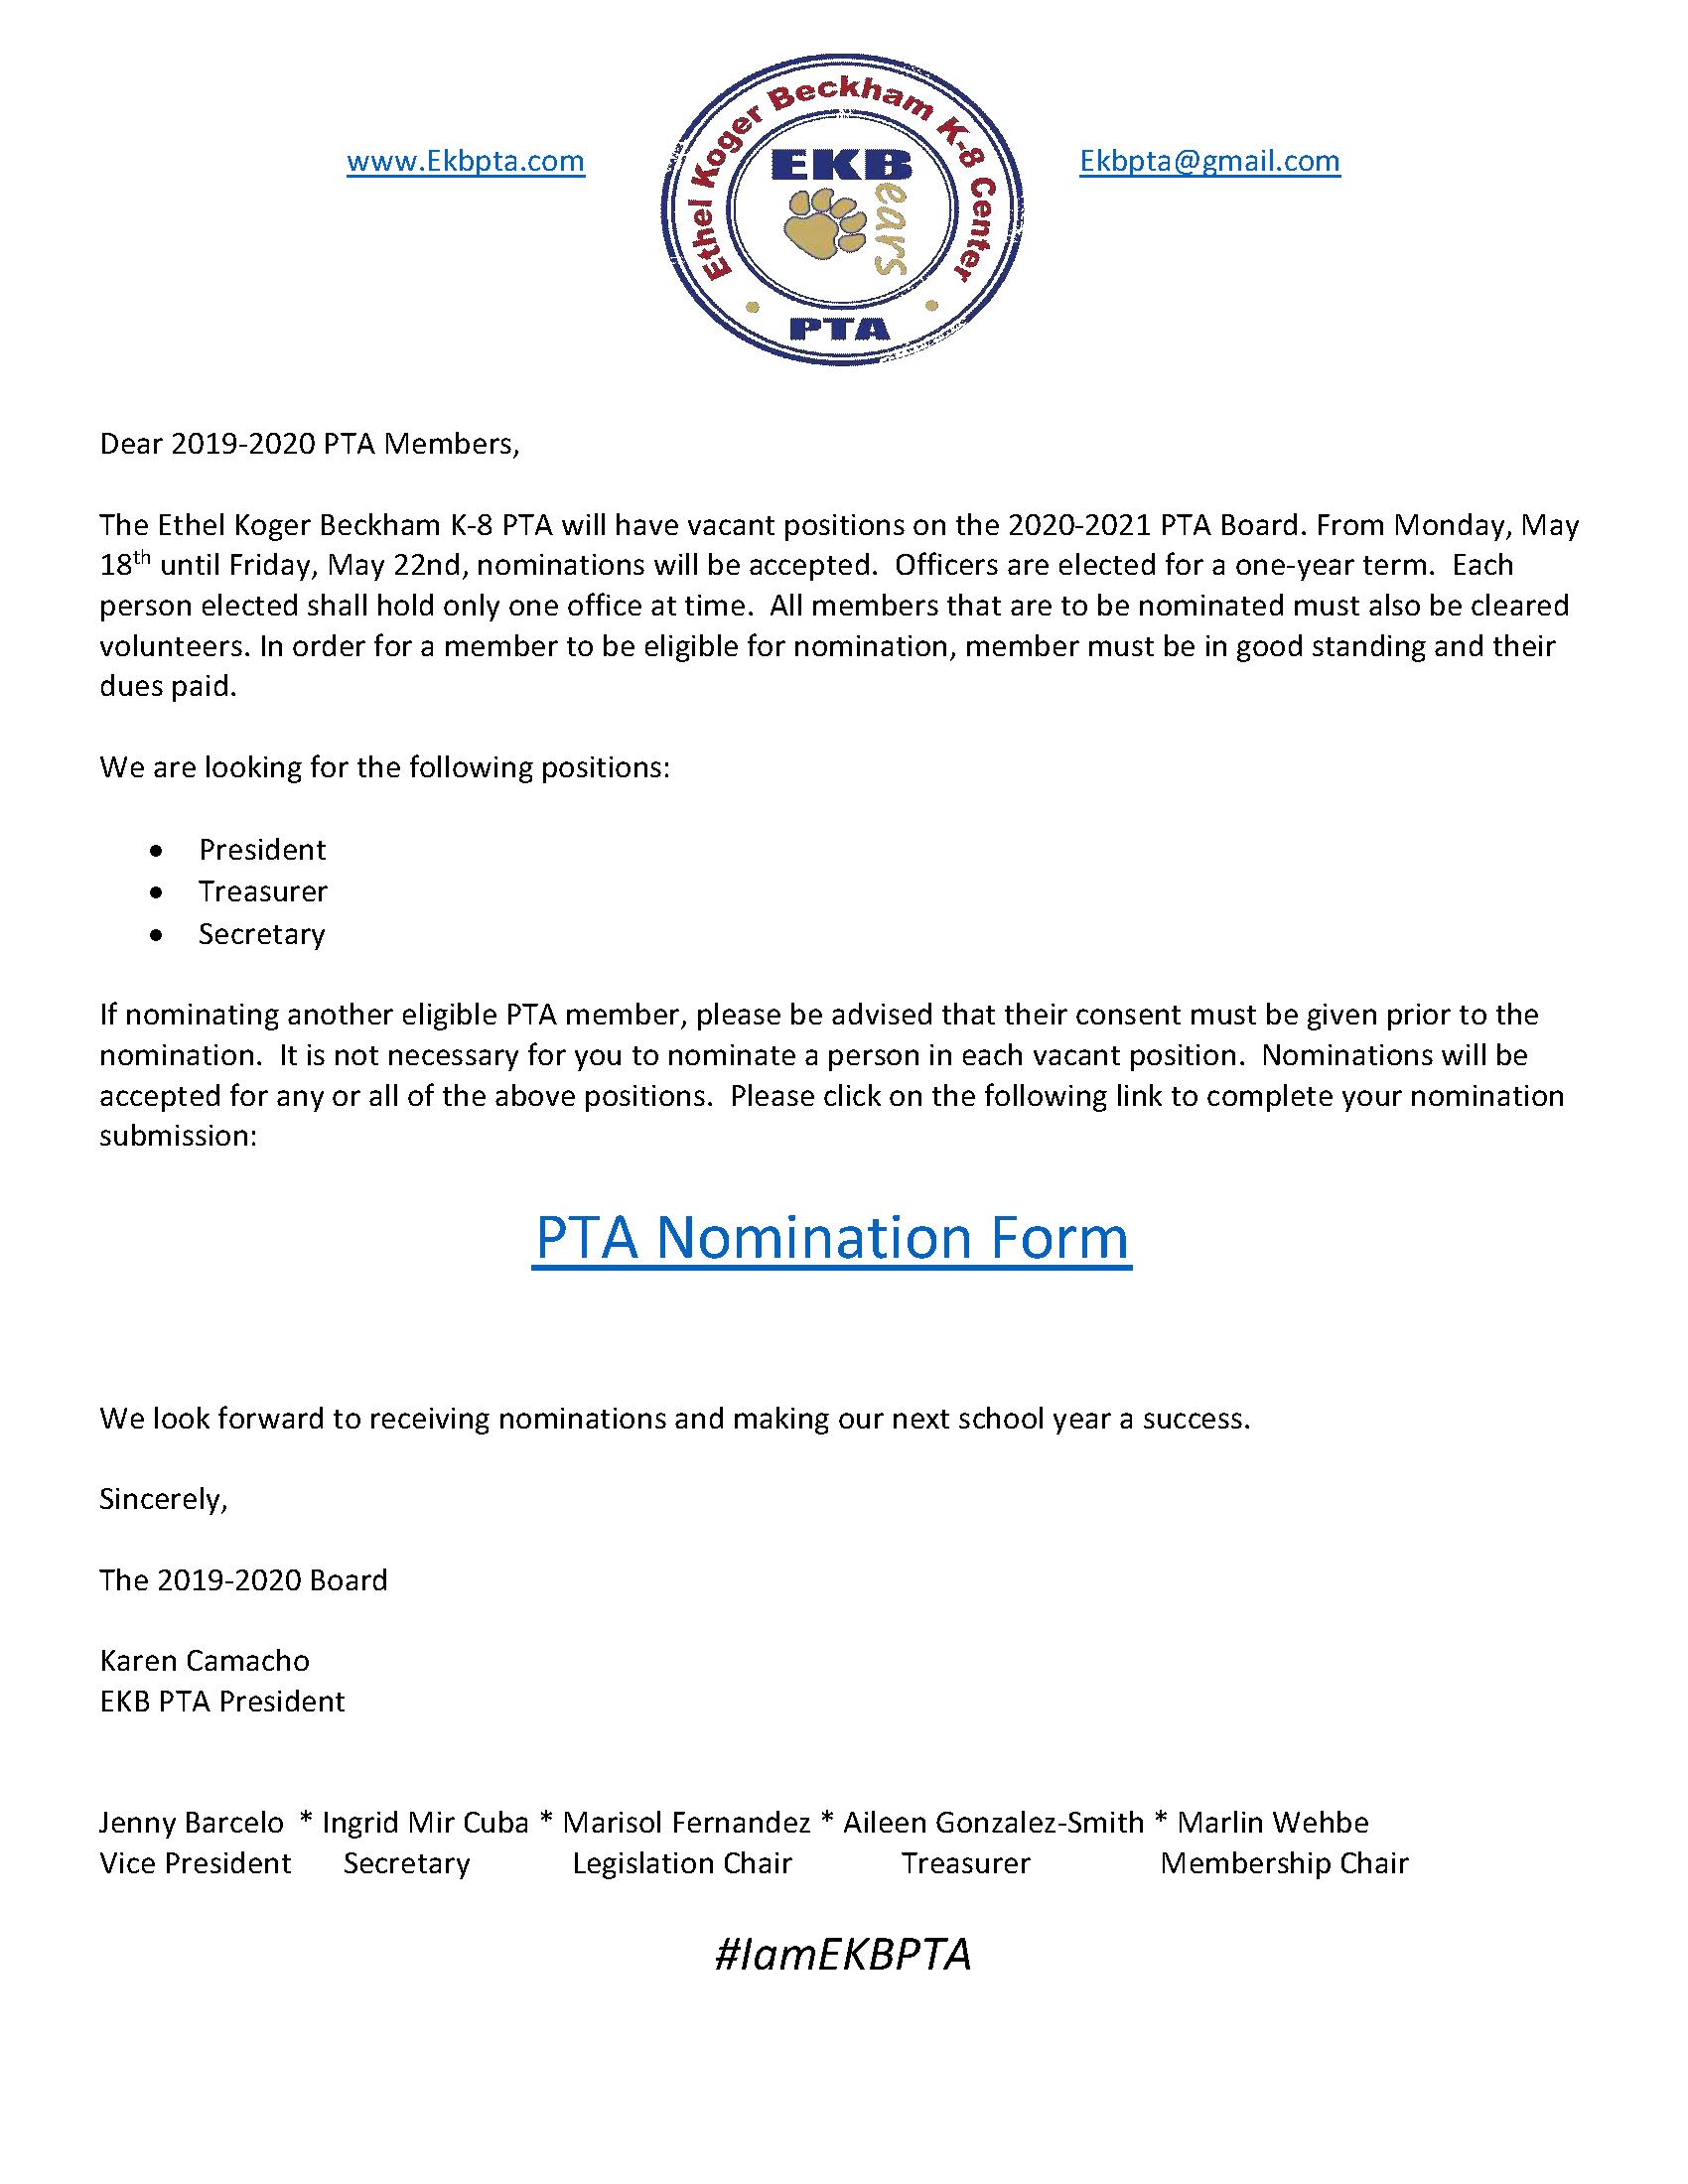 PTA Nomination Announcement